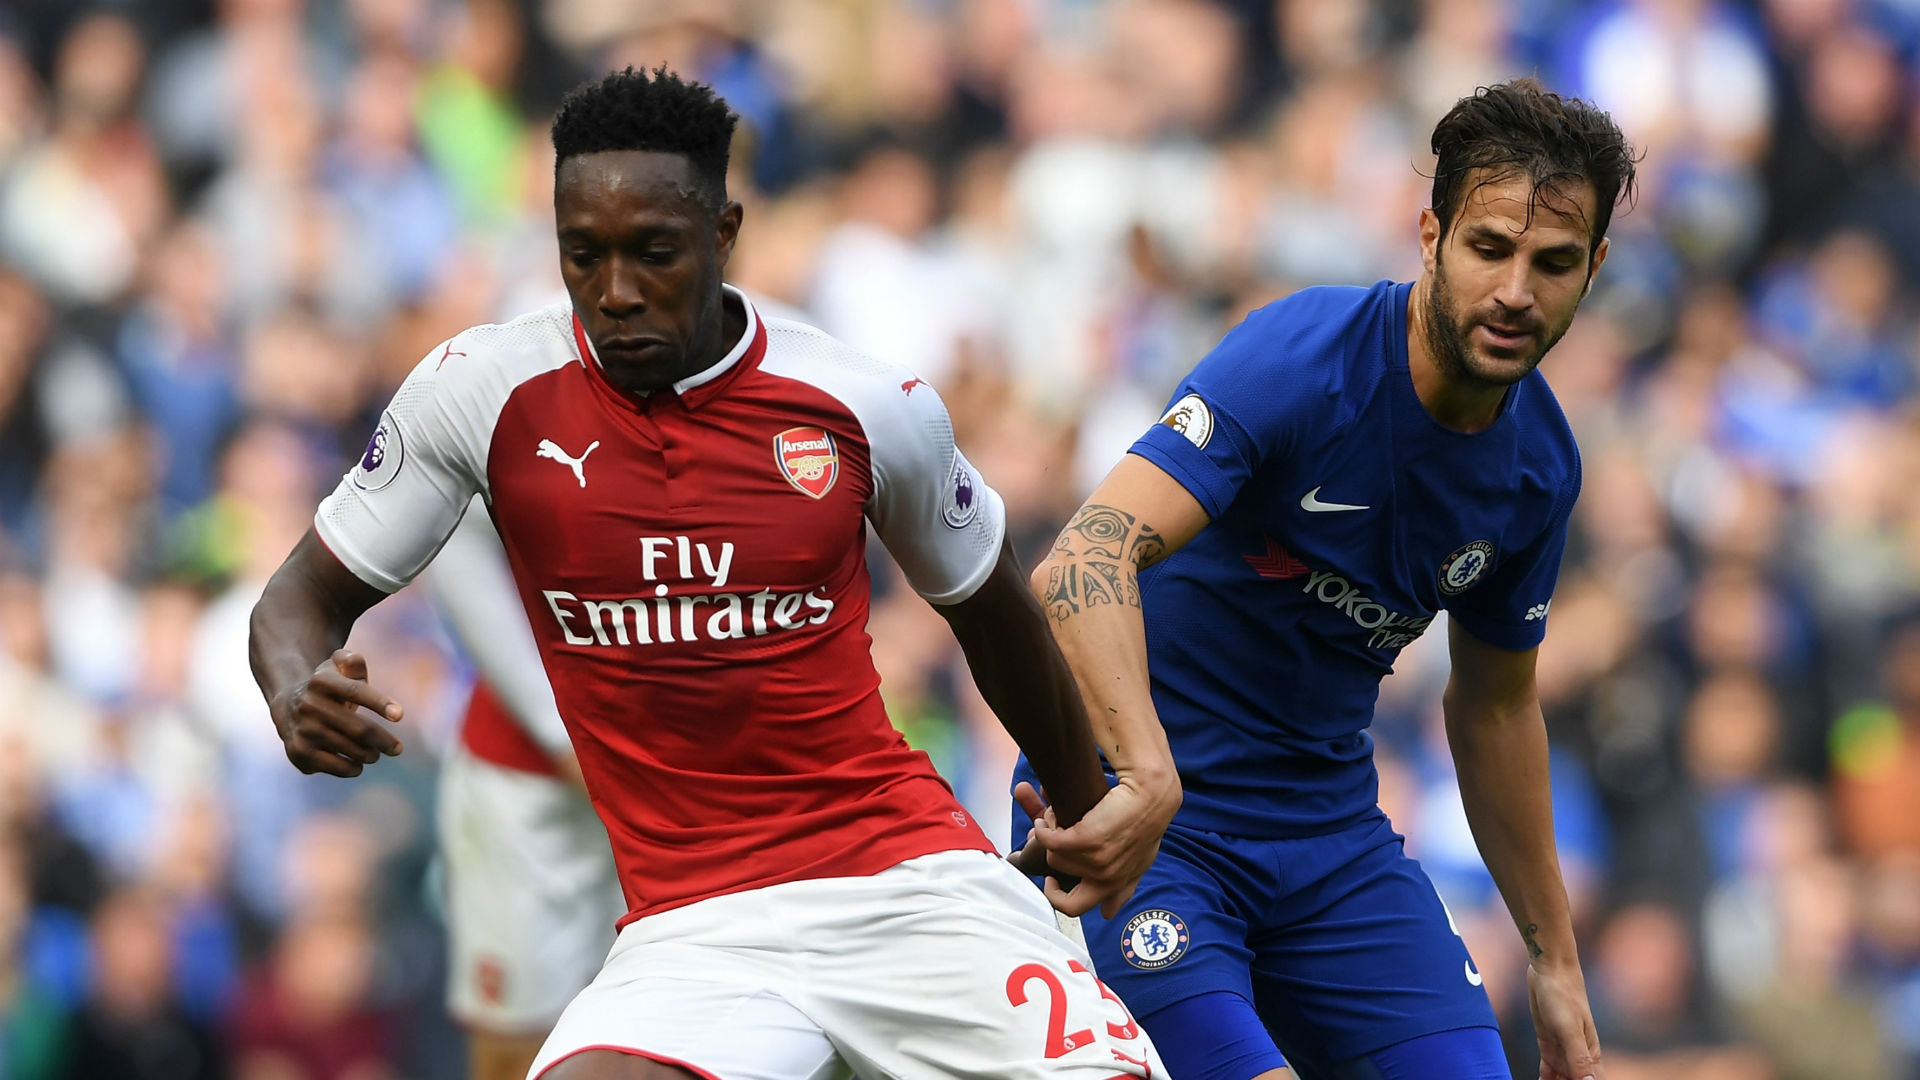 Danny Welbeck Arsenal Cesc Fabregas Chelsea 170917